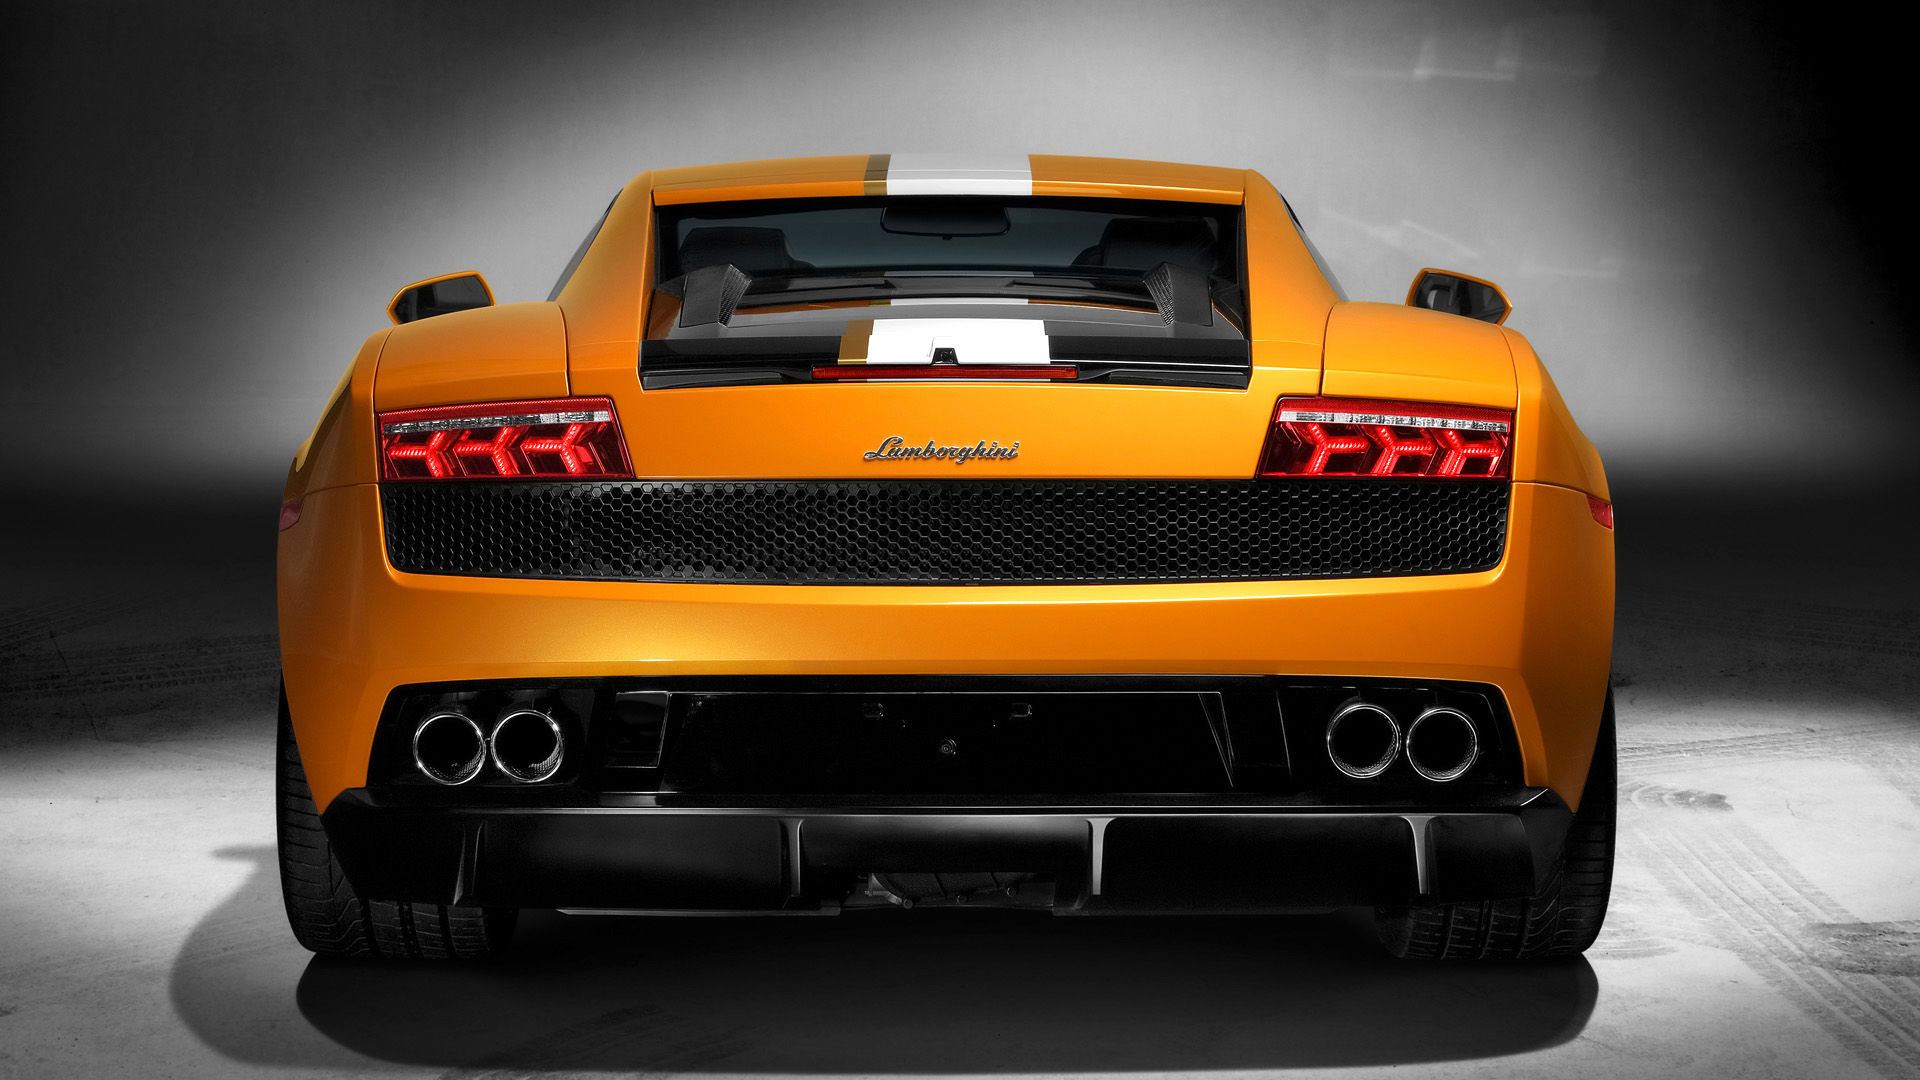 2009 Lamborghini Gallardo LP550-2 Balboni